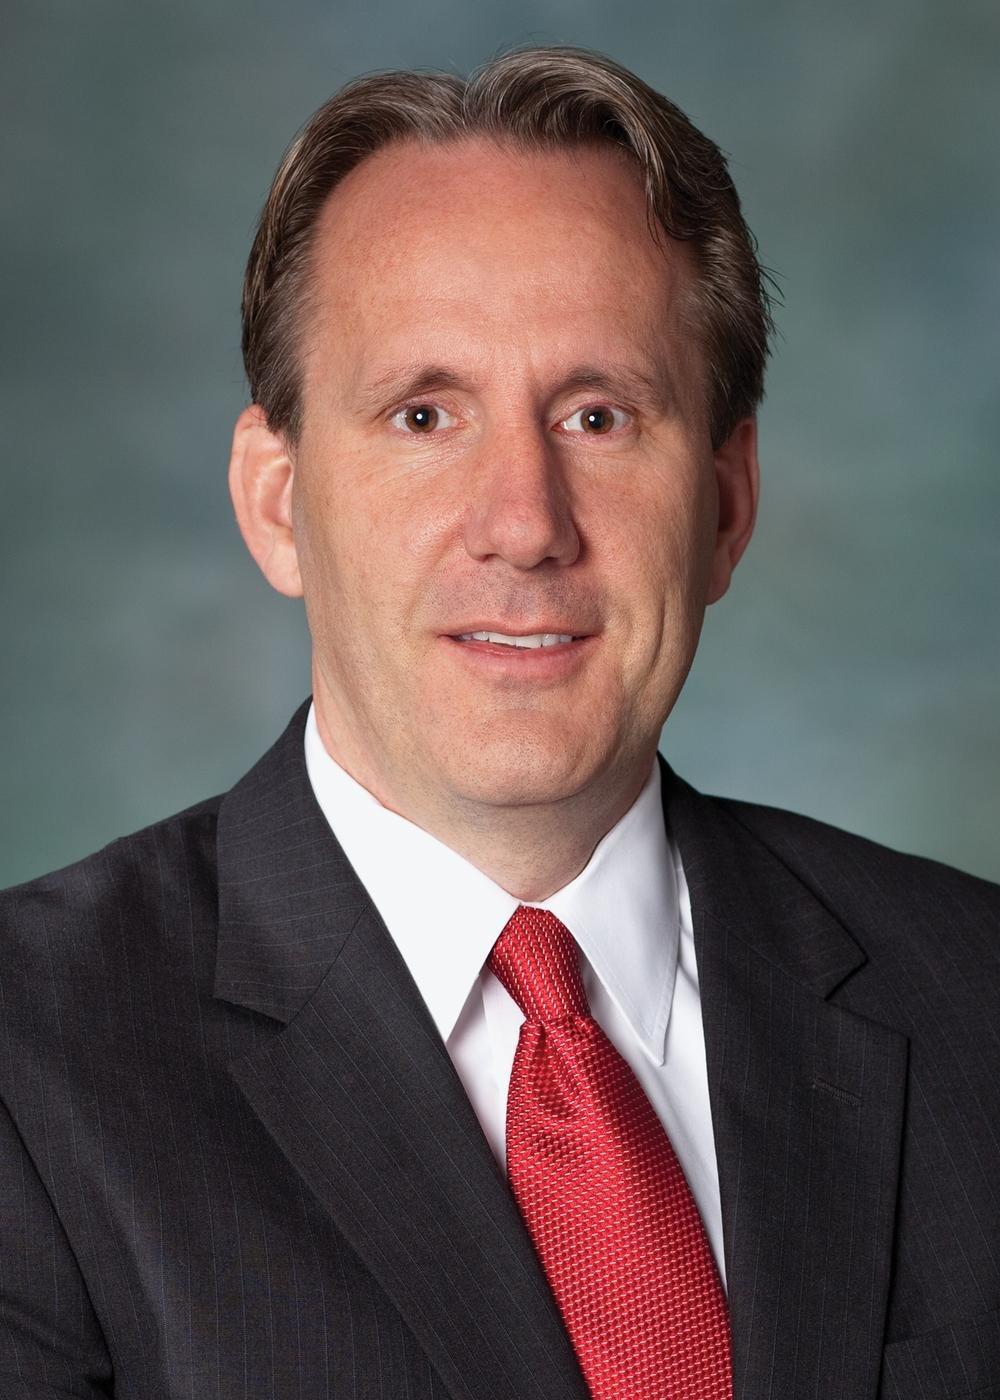 Darrell Johnson, Vp And General Manager, Chrf, Medtronic